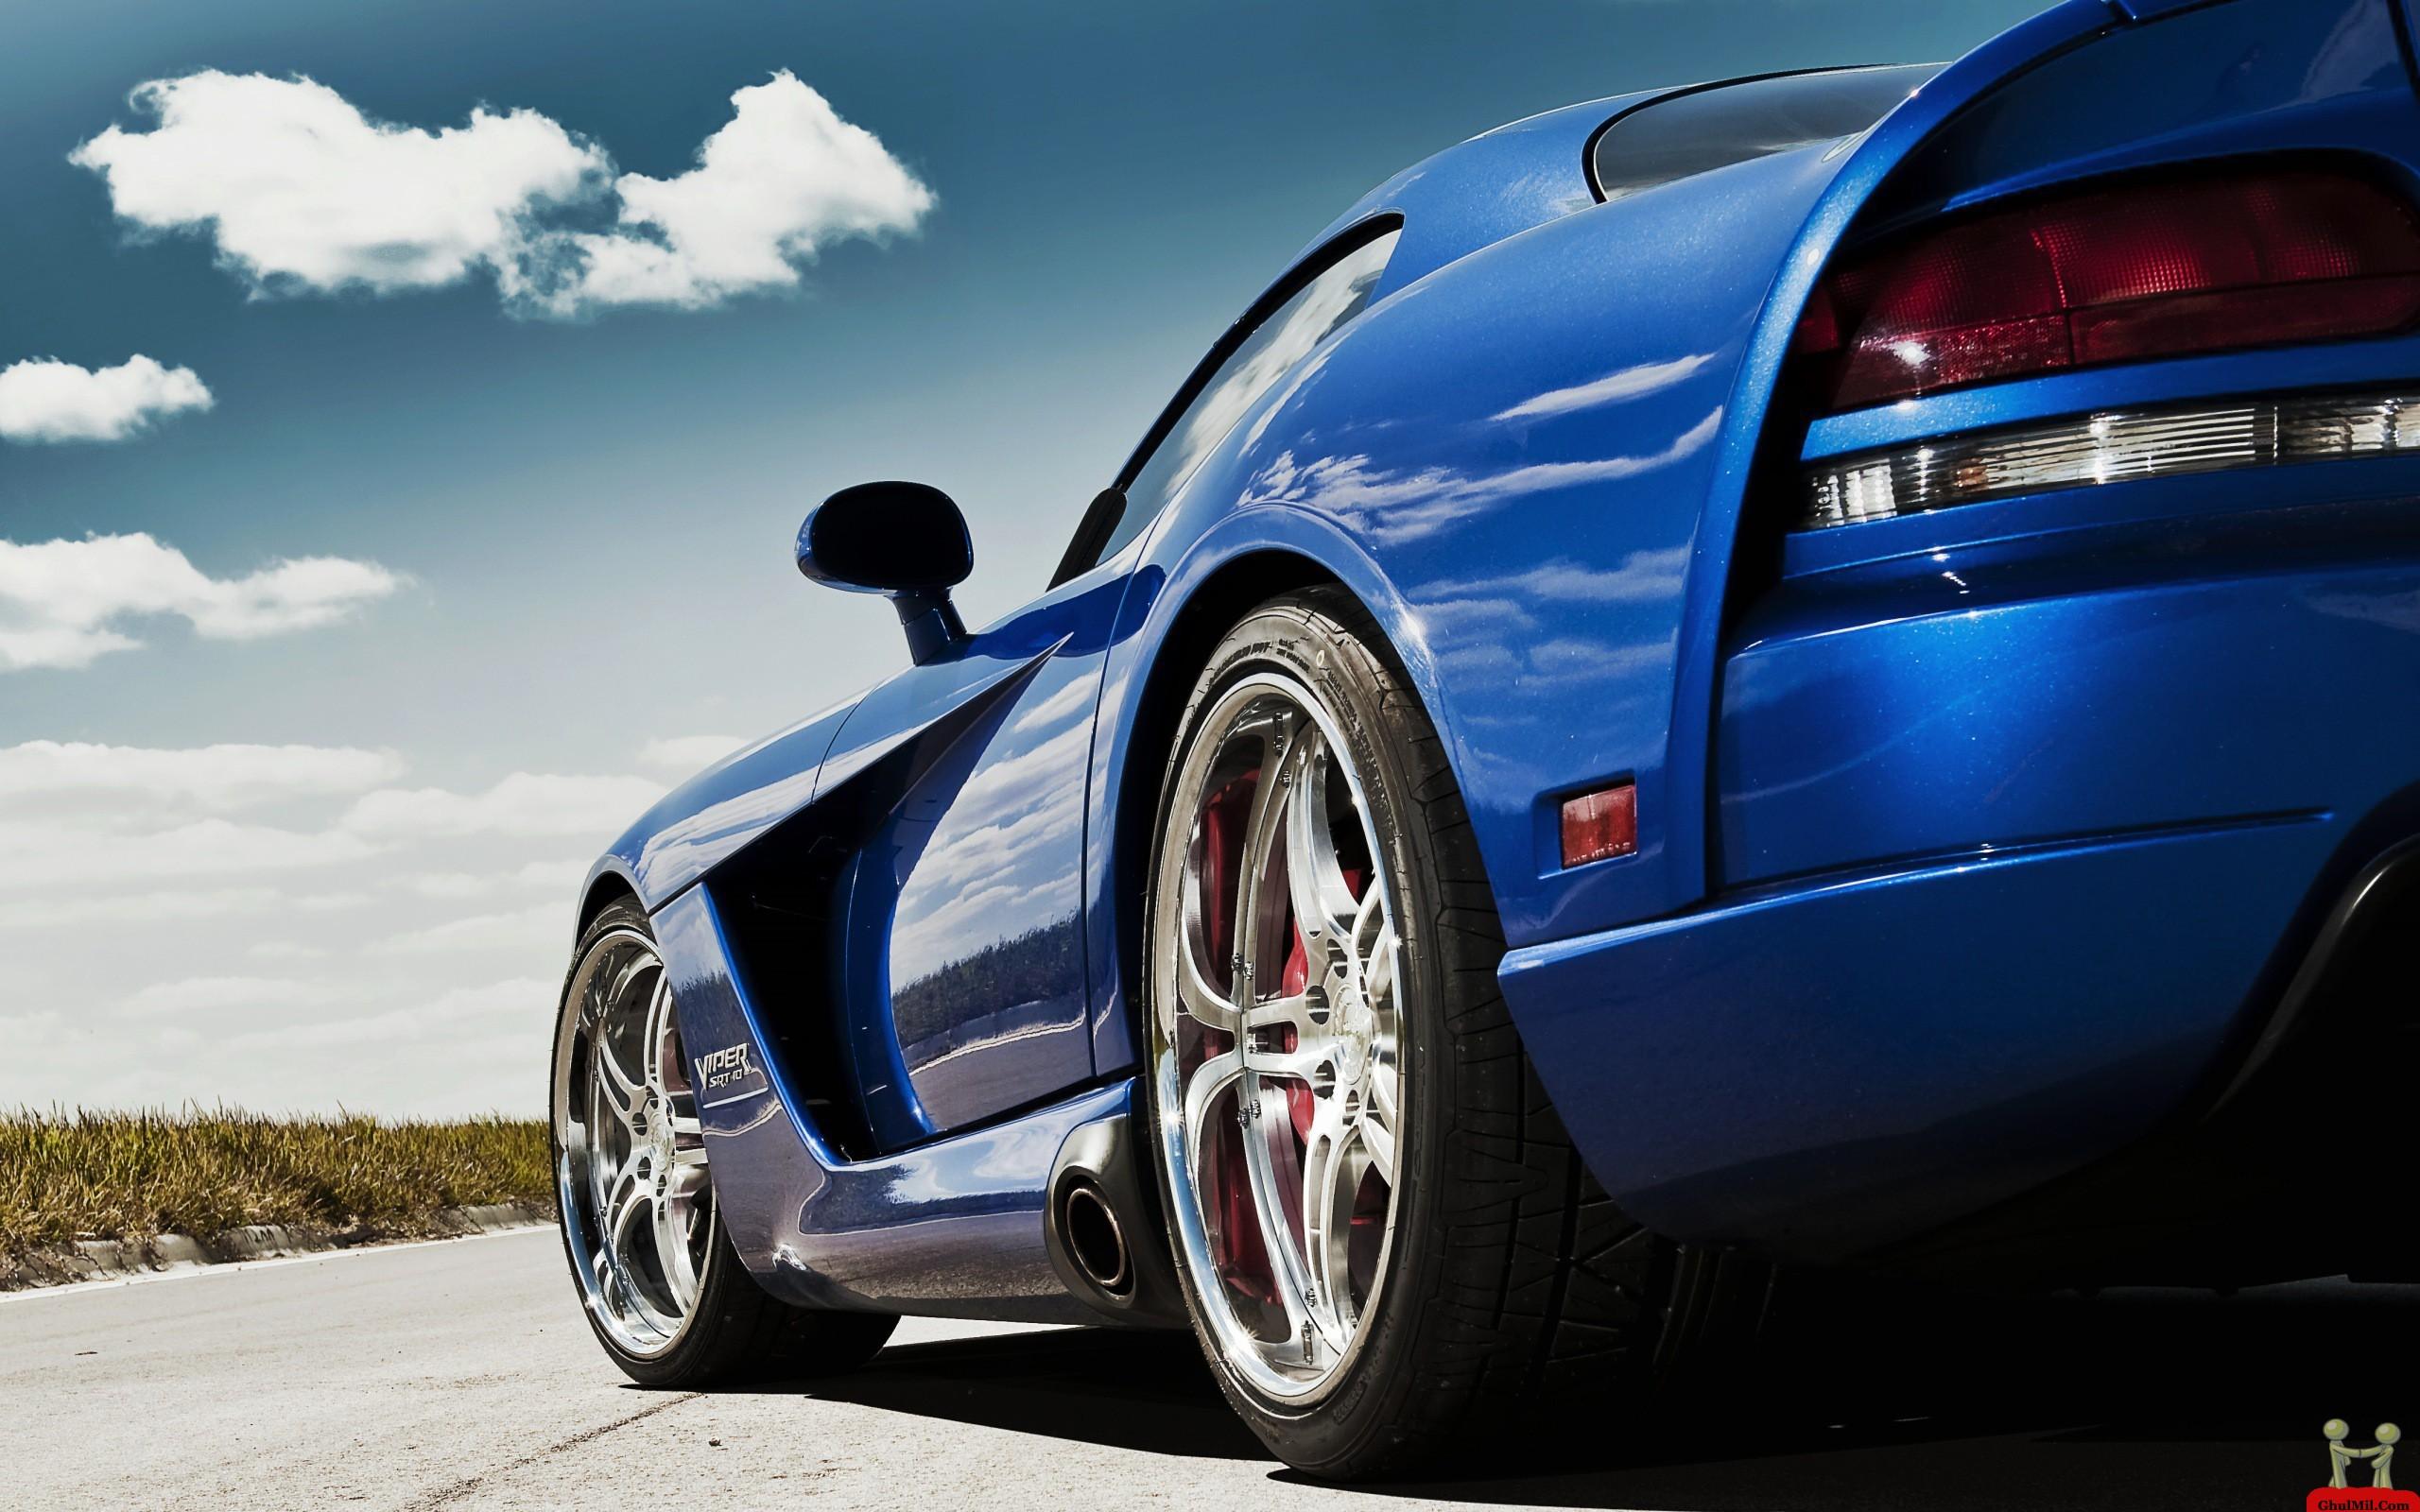 Dodge Viper Car Beautiful HD Wallpapers E Entertainment 2560x1600